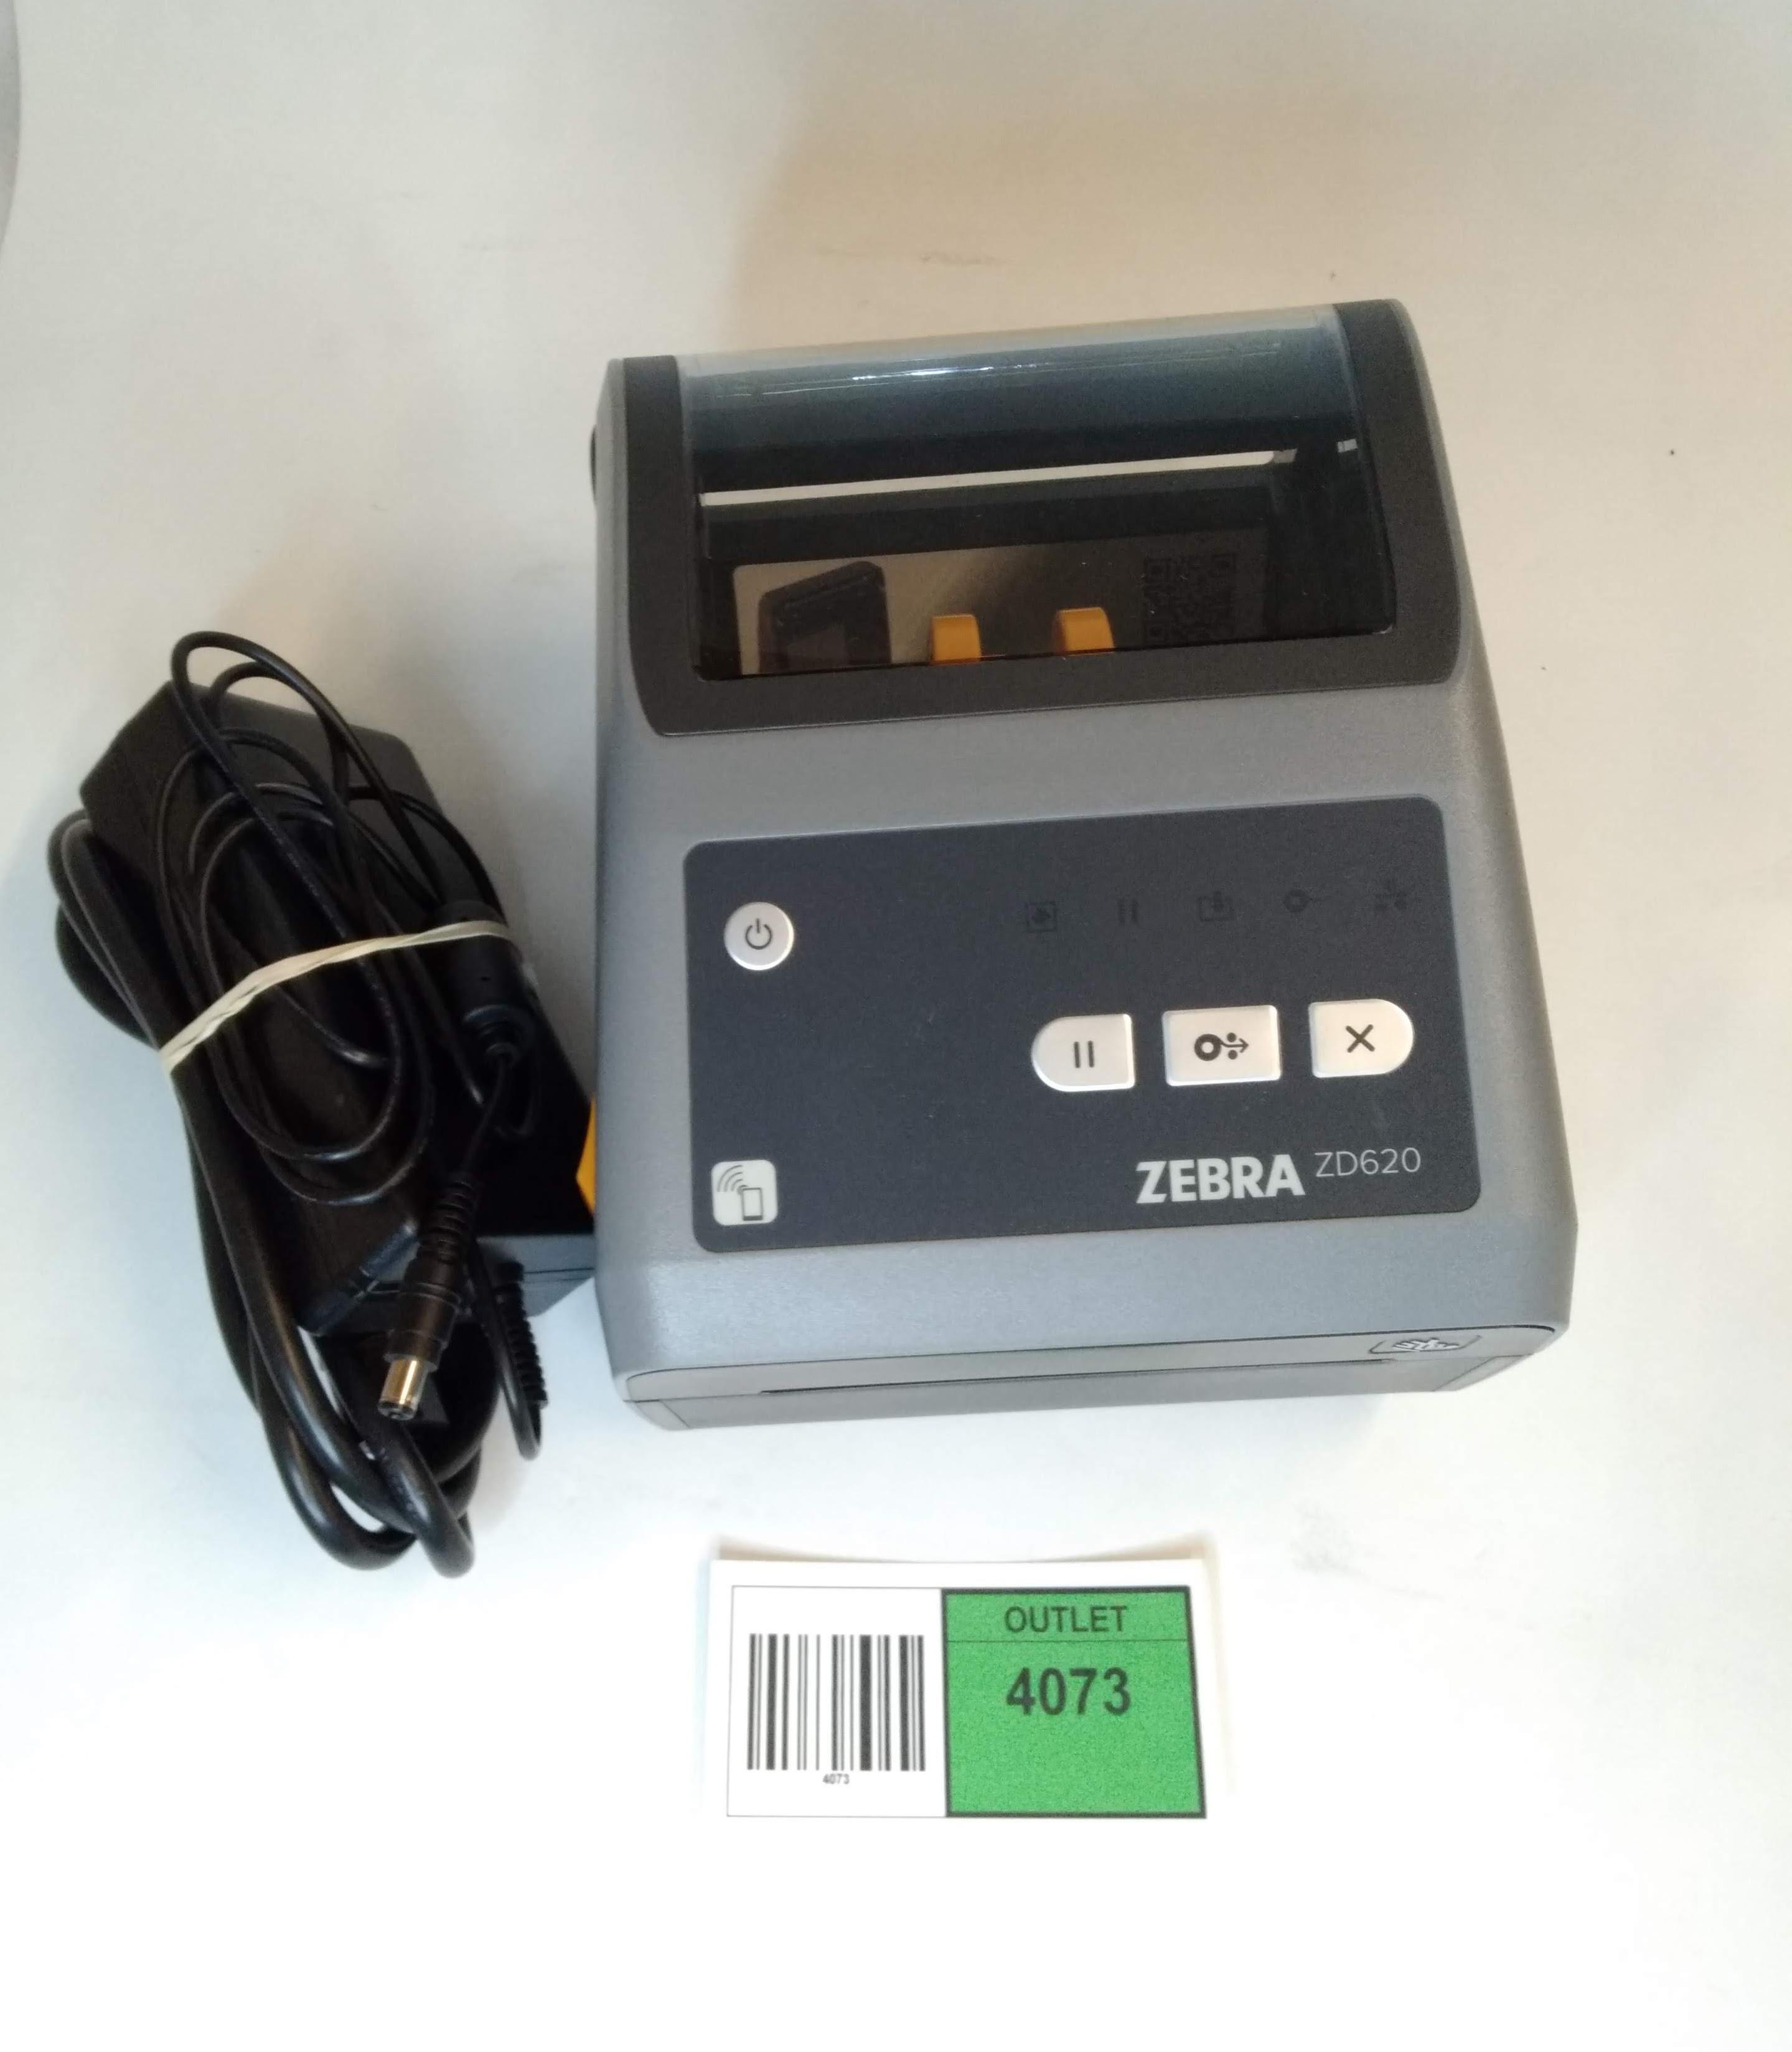 Zebra ZD620 ZD62042-D01F00EZ Image 1